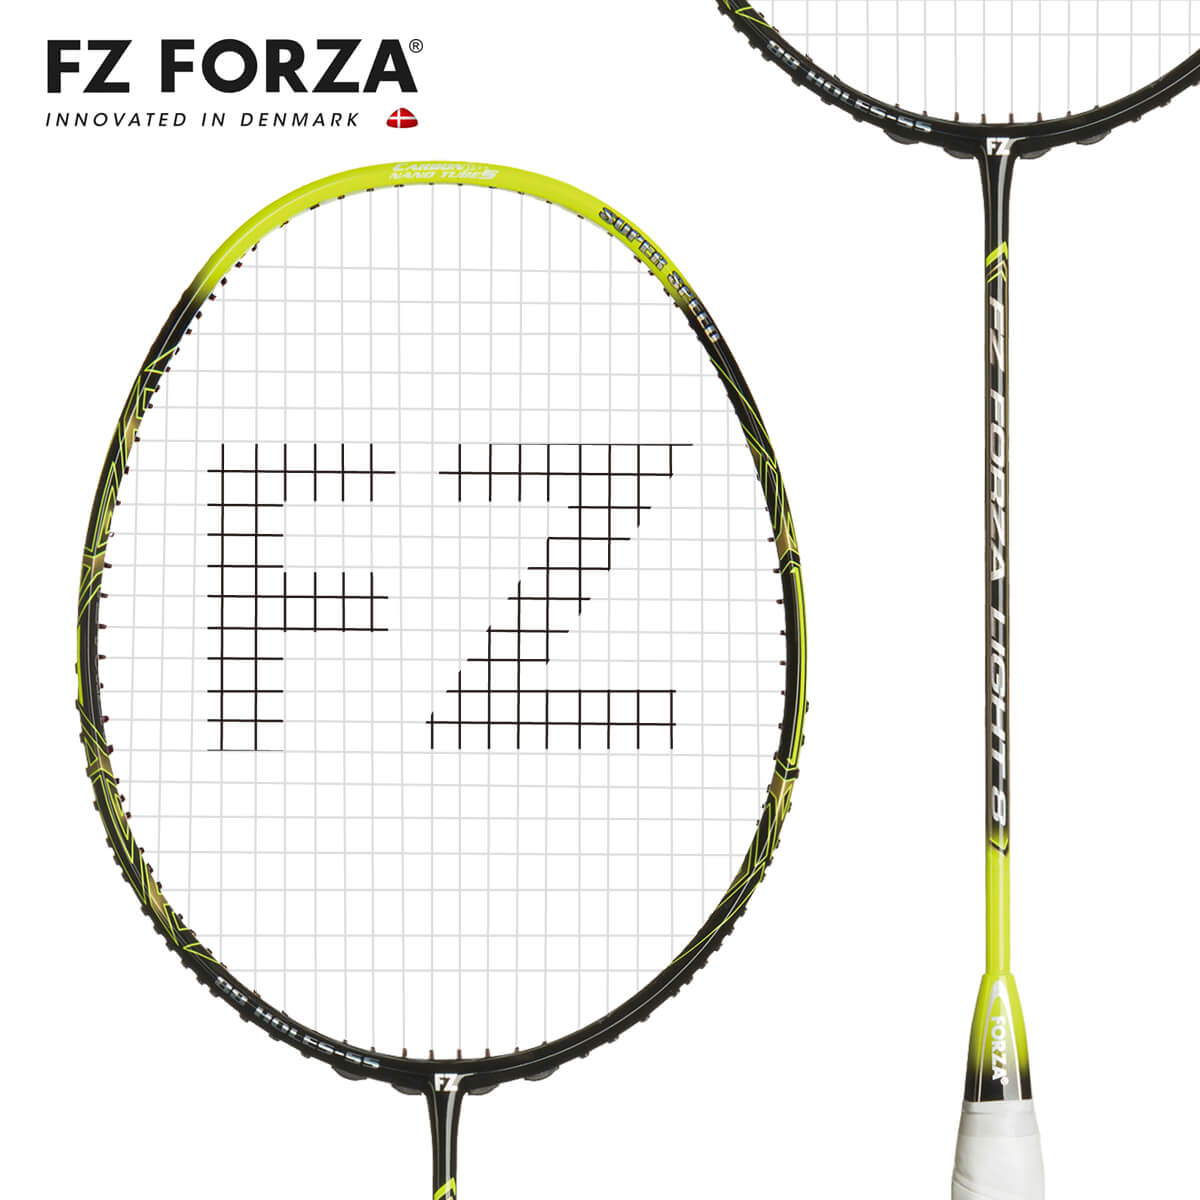 FZ FORZA LIGHT8 超軽量 SuperSpeed FZ フォーザ バドミントンラケット【オススメガット&ガット張り工賃無料/ 数量限定】